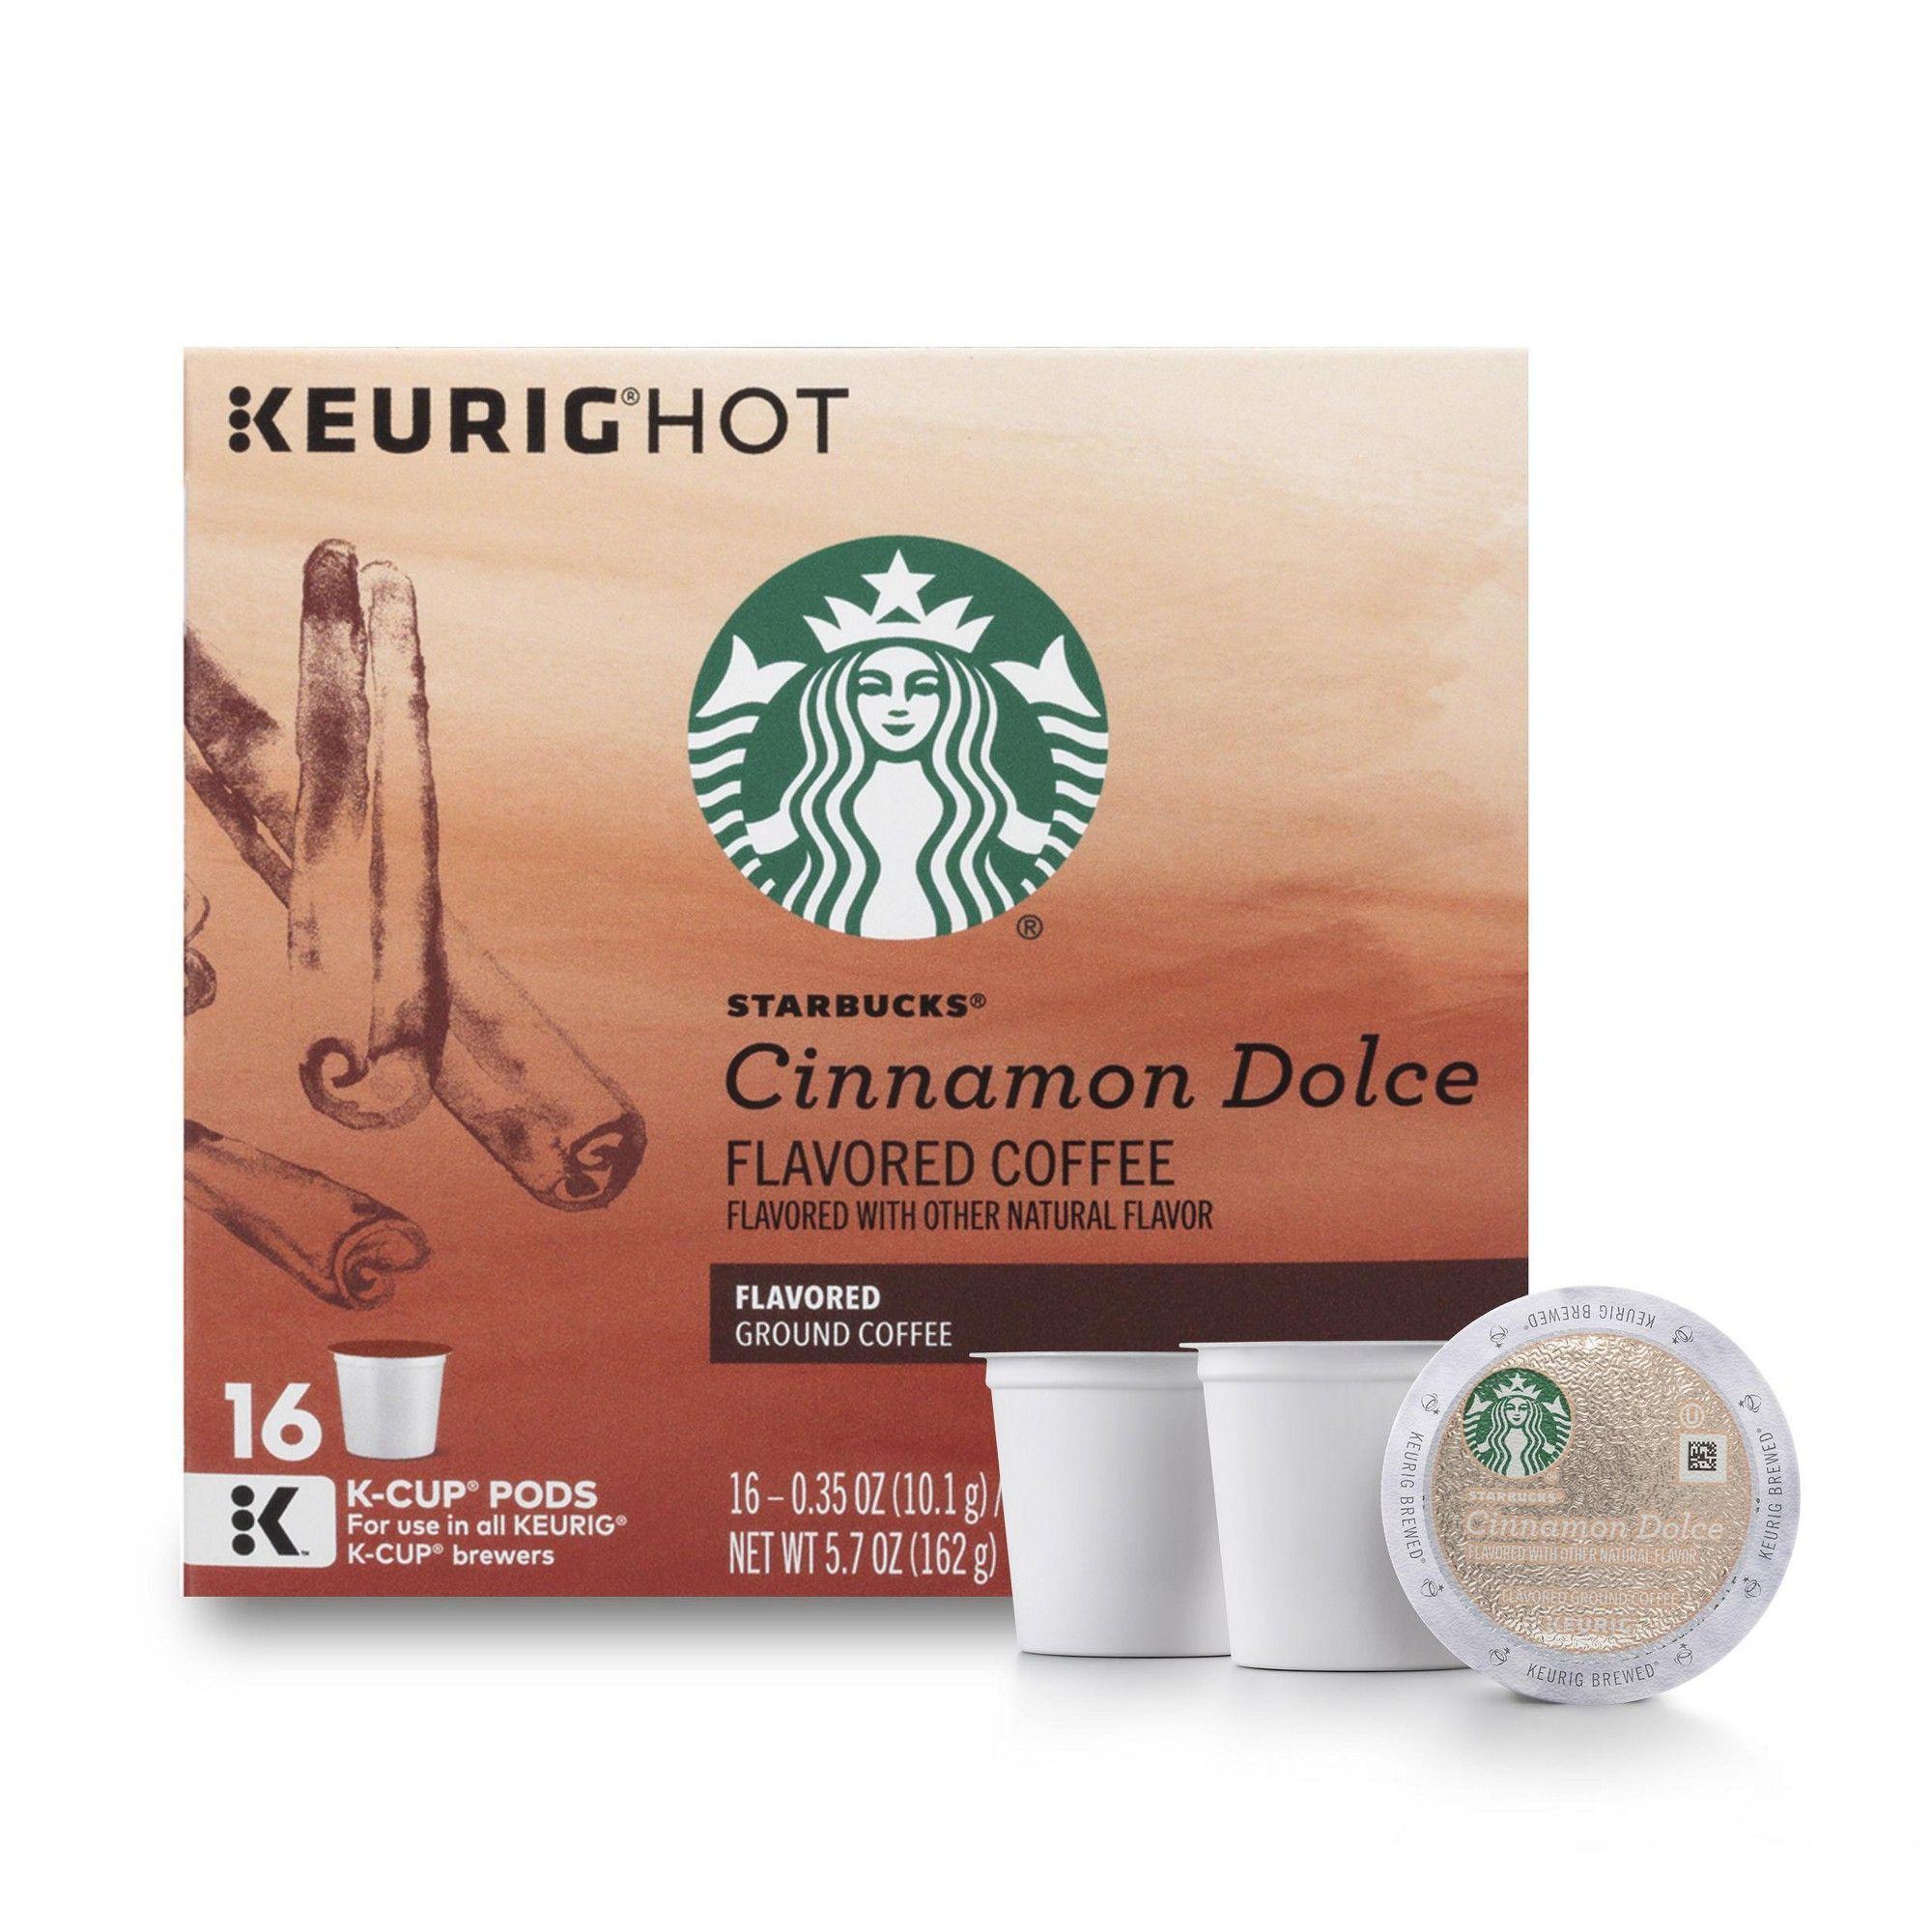 Starbucks Cinnamon Dolce Light Roast Coffee